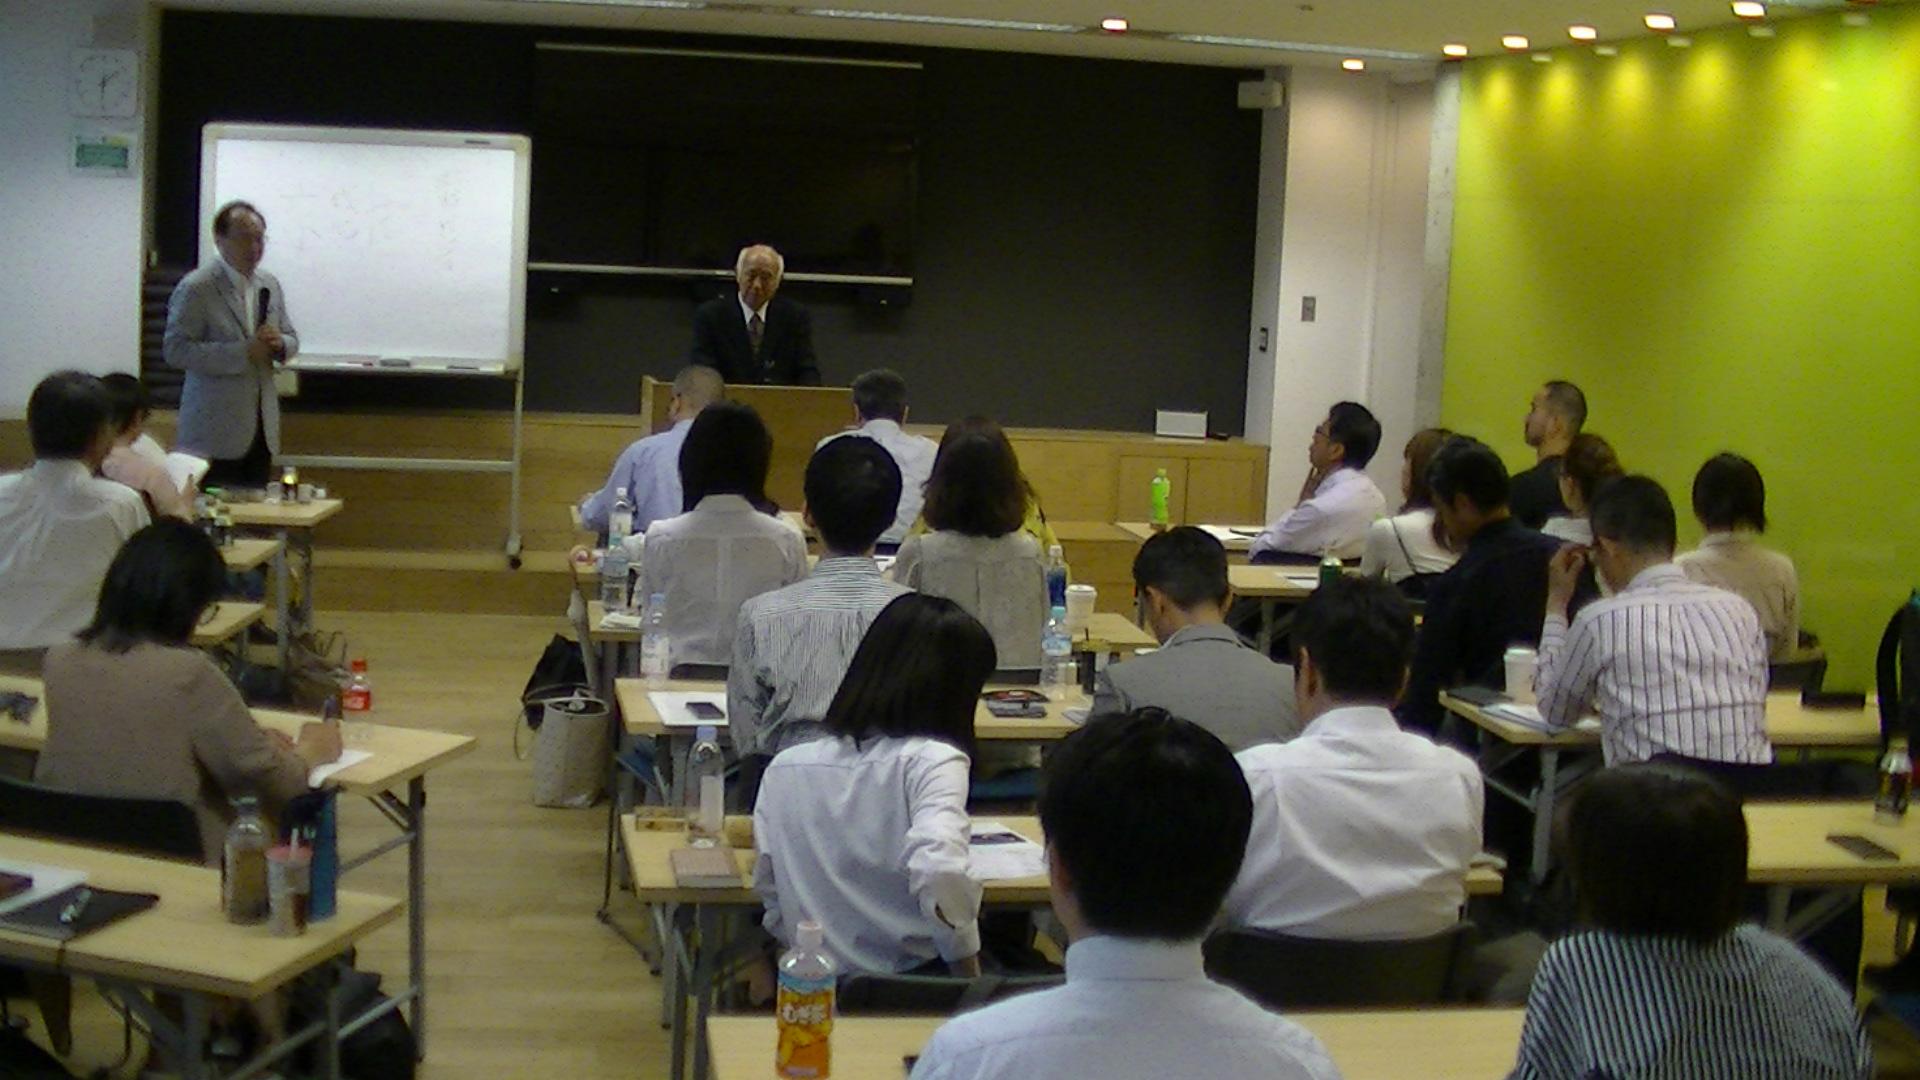 PIC 1075 - 思風会全国大会in広島